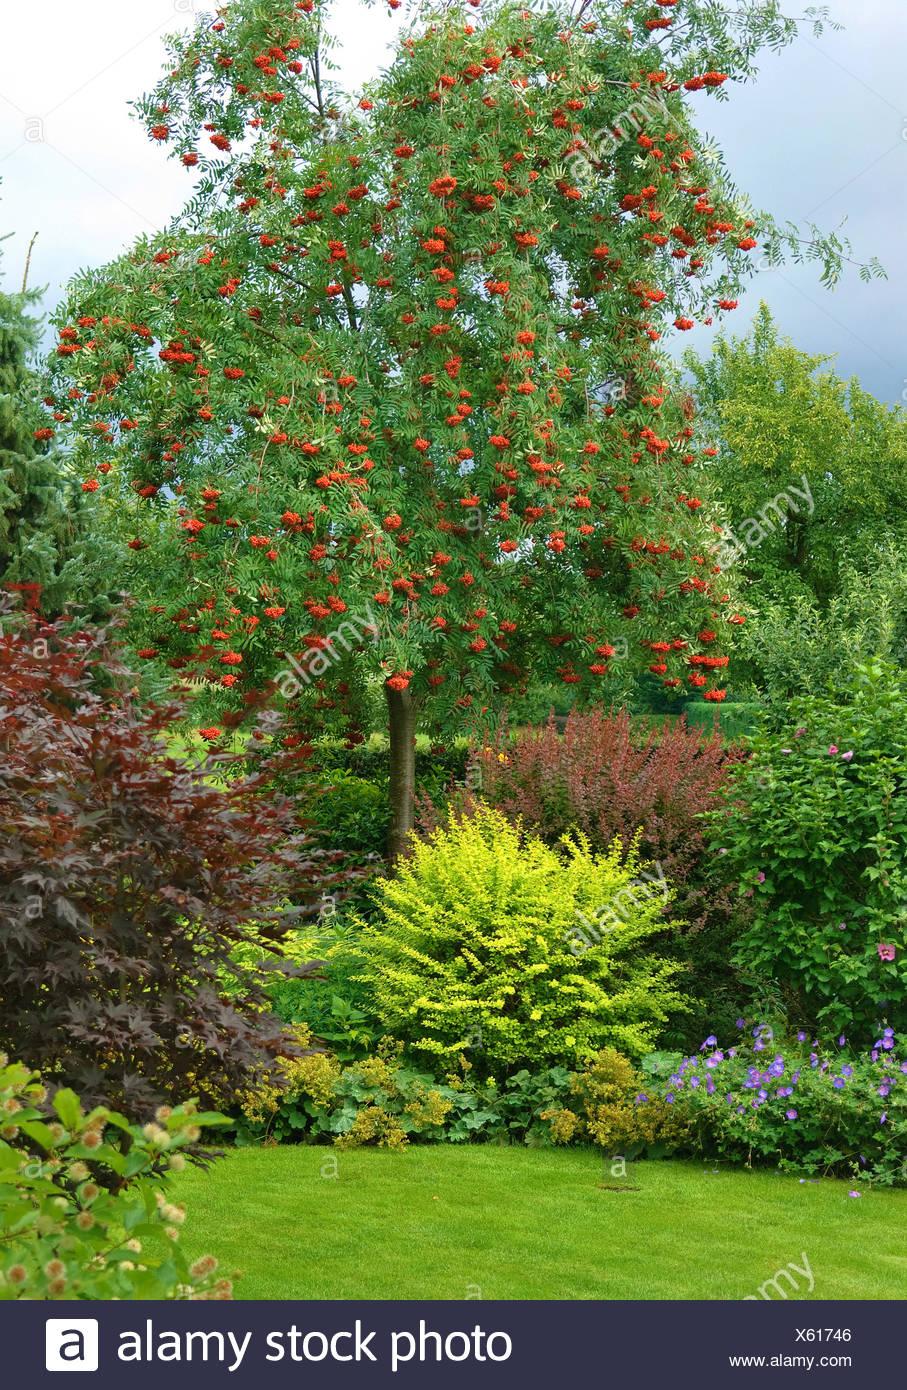 European mountain-ash, rowan tree (Sorbus aucuparia 'Rosina', Sorbus aucuparia Rosina), cultivar Rosina in a garden, Germany - Stock Image